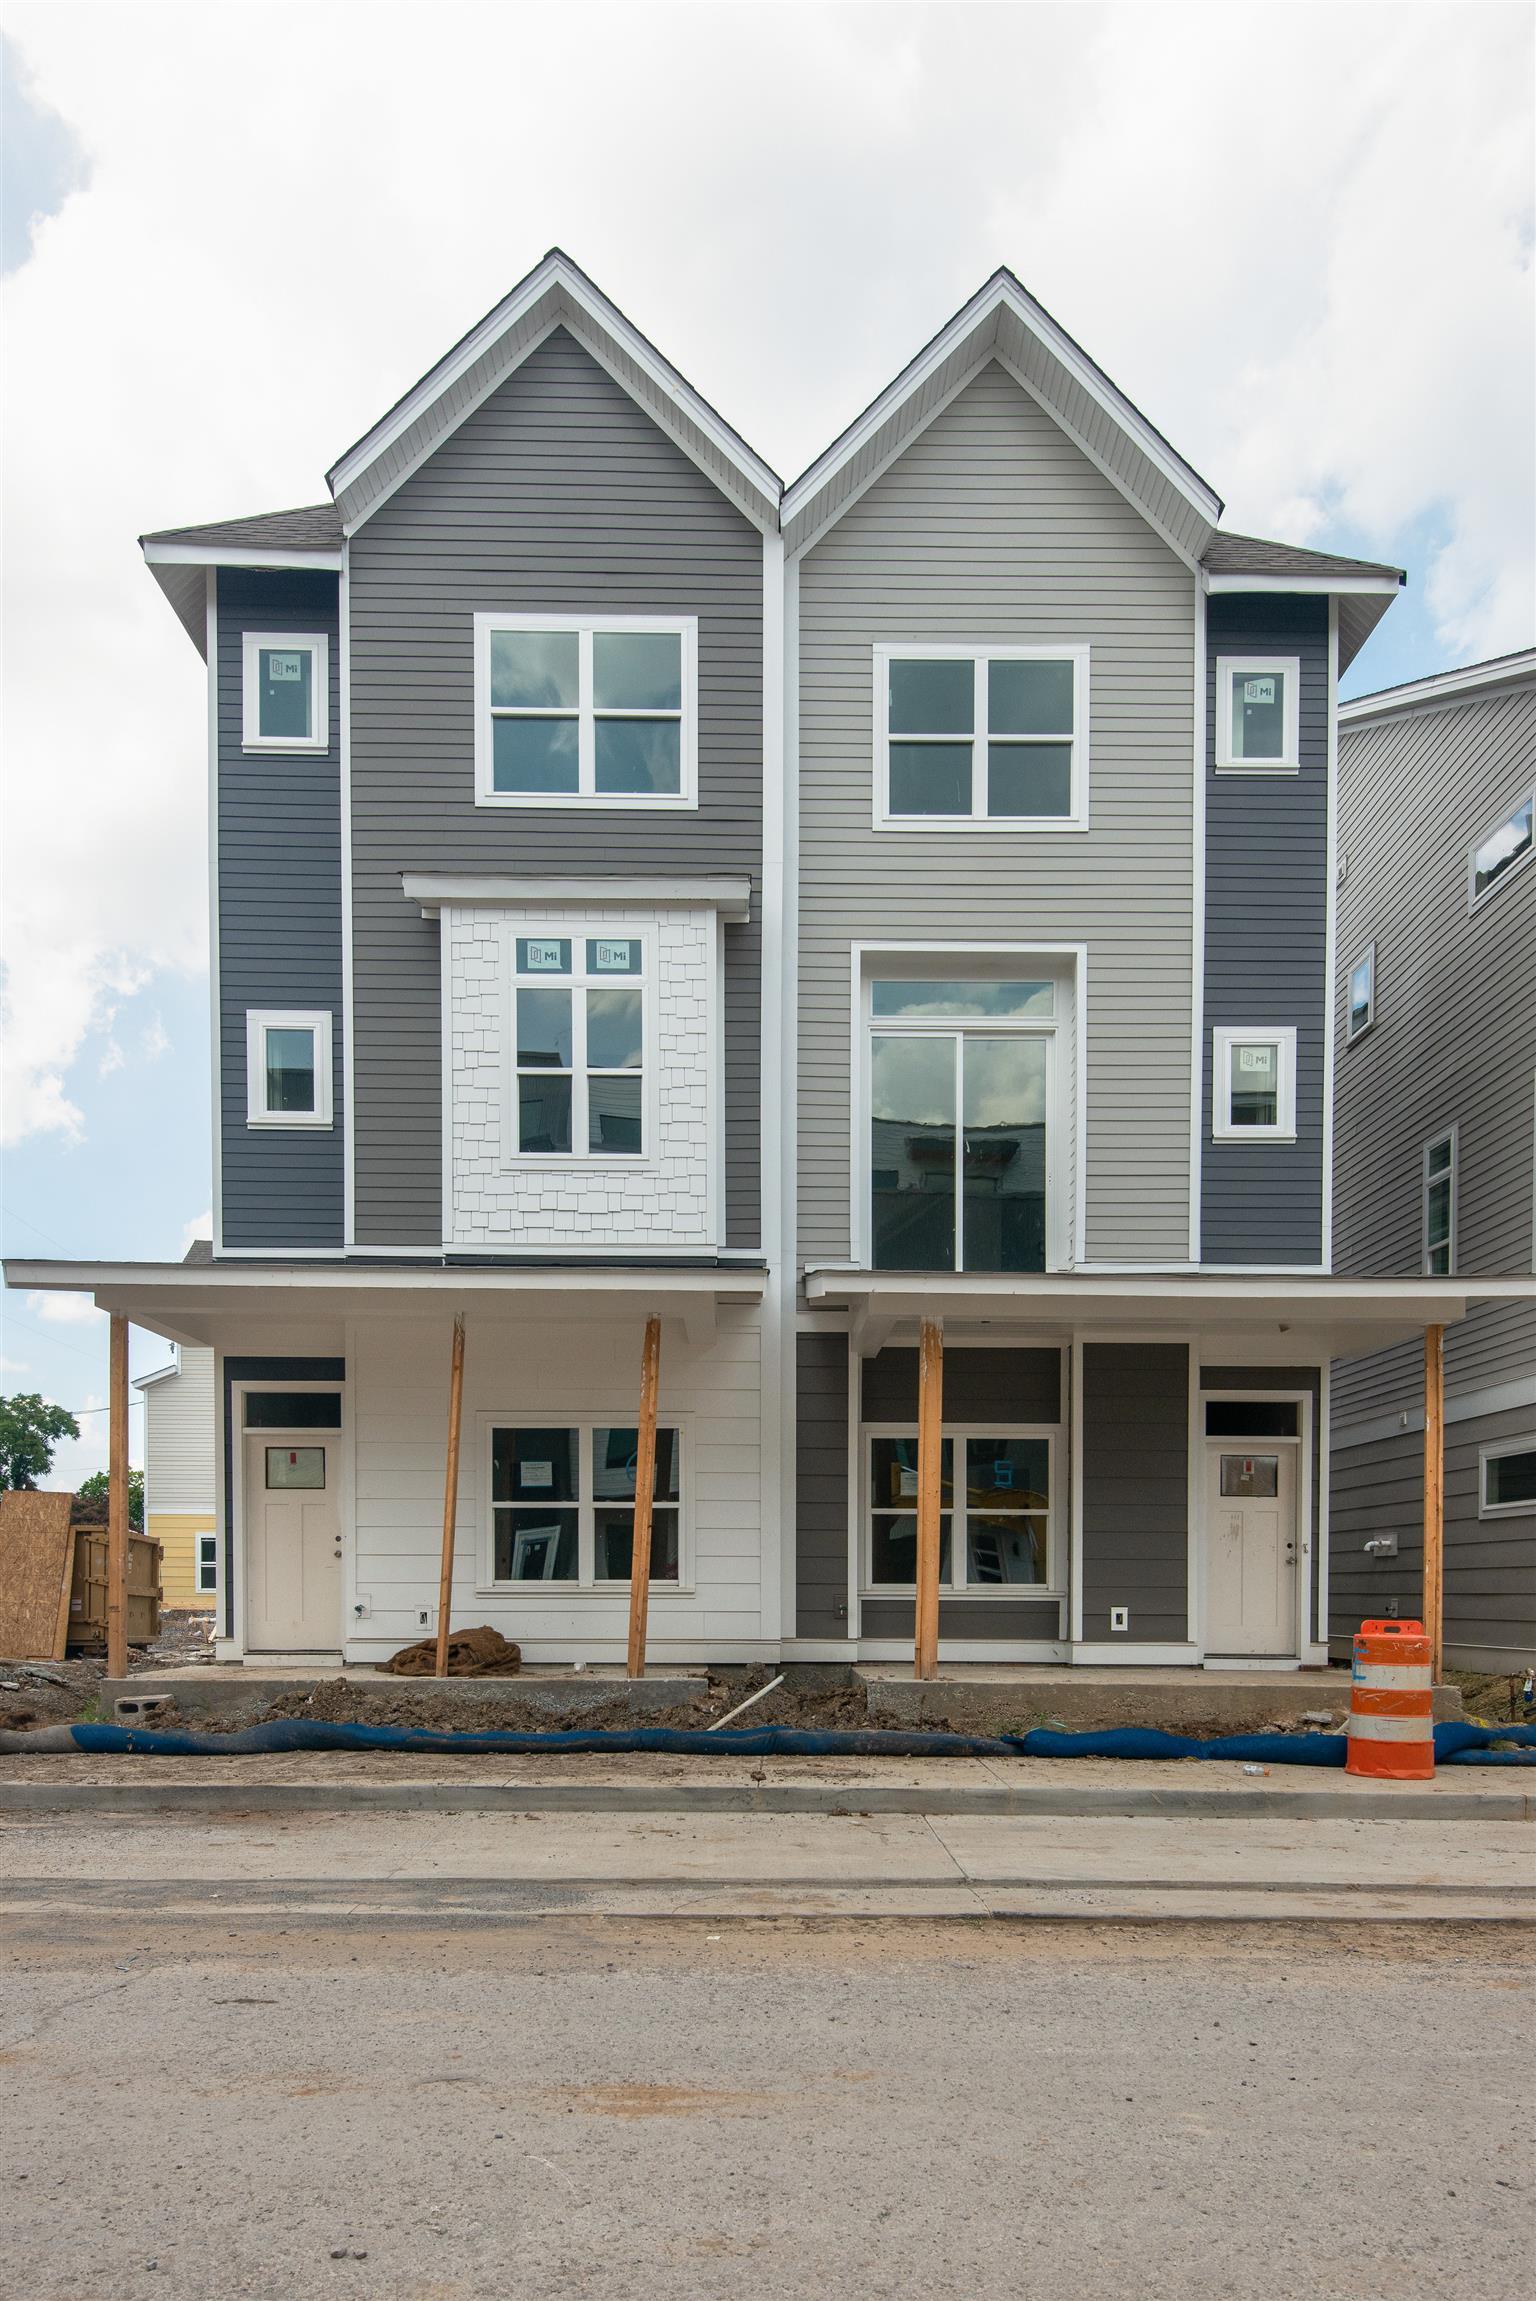 440 Merritt Avenue, Nashville - Midtown in Davidson County County, TN 37203 Home for Sale